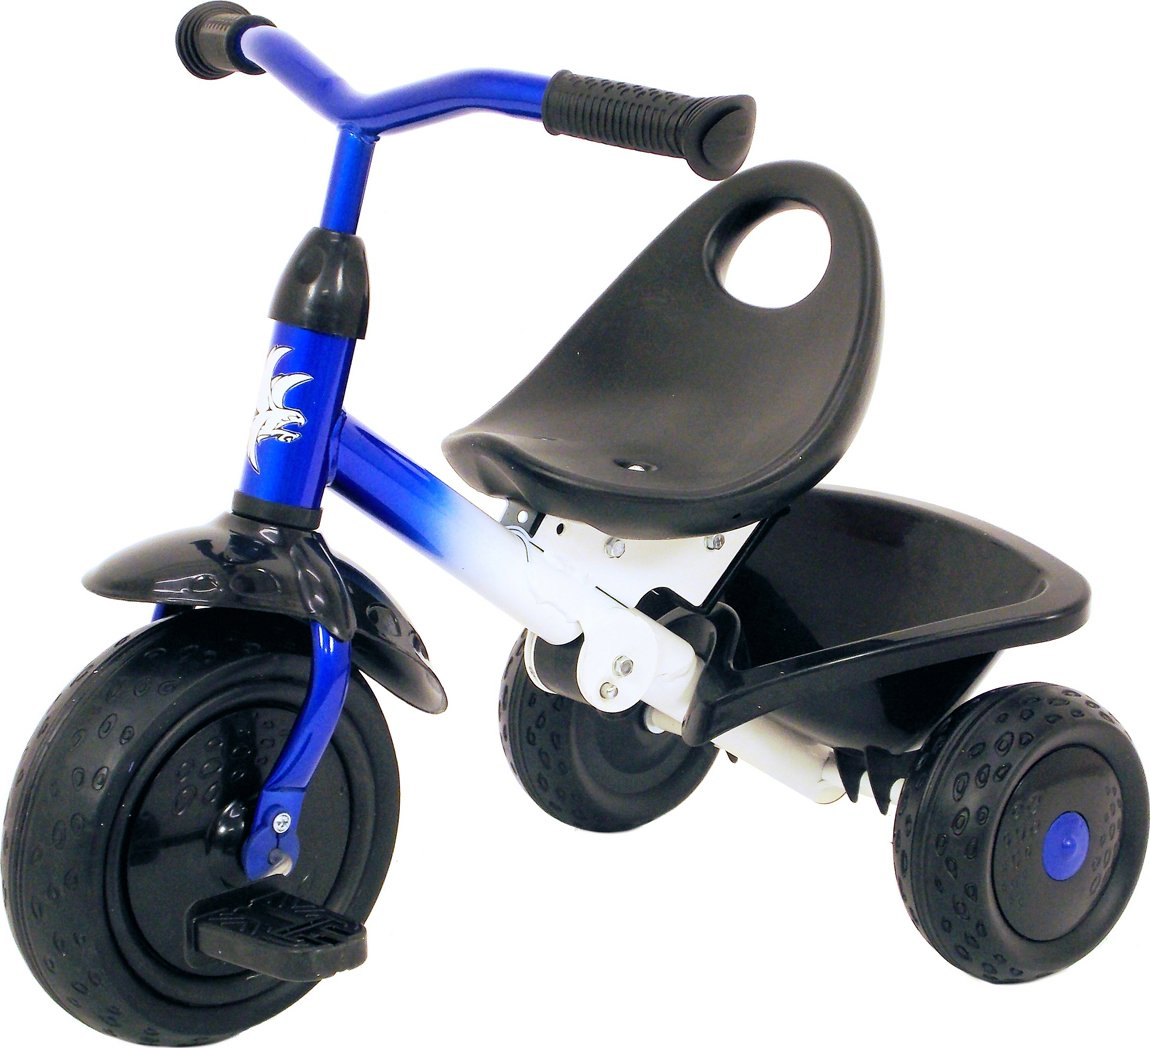 Kiddi-o by Kettler Fold 'n Ride Trike with Adjustable Sea...